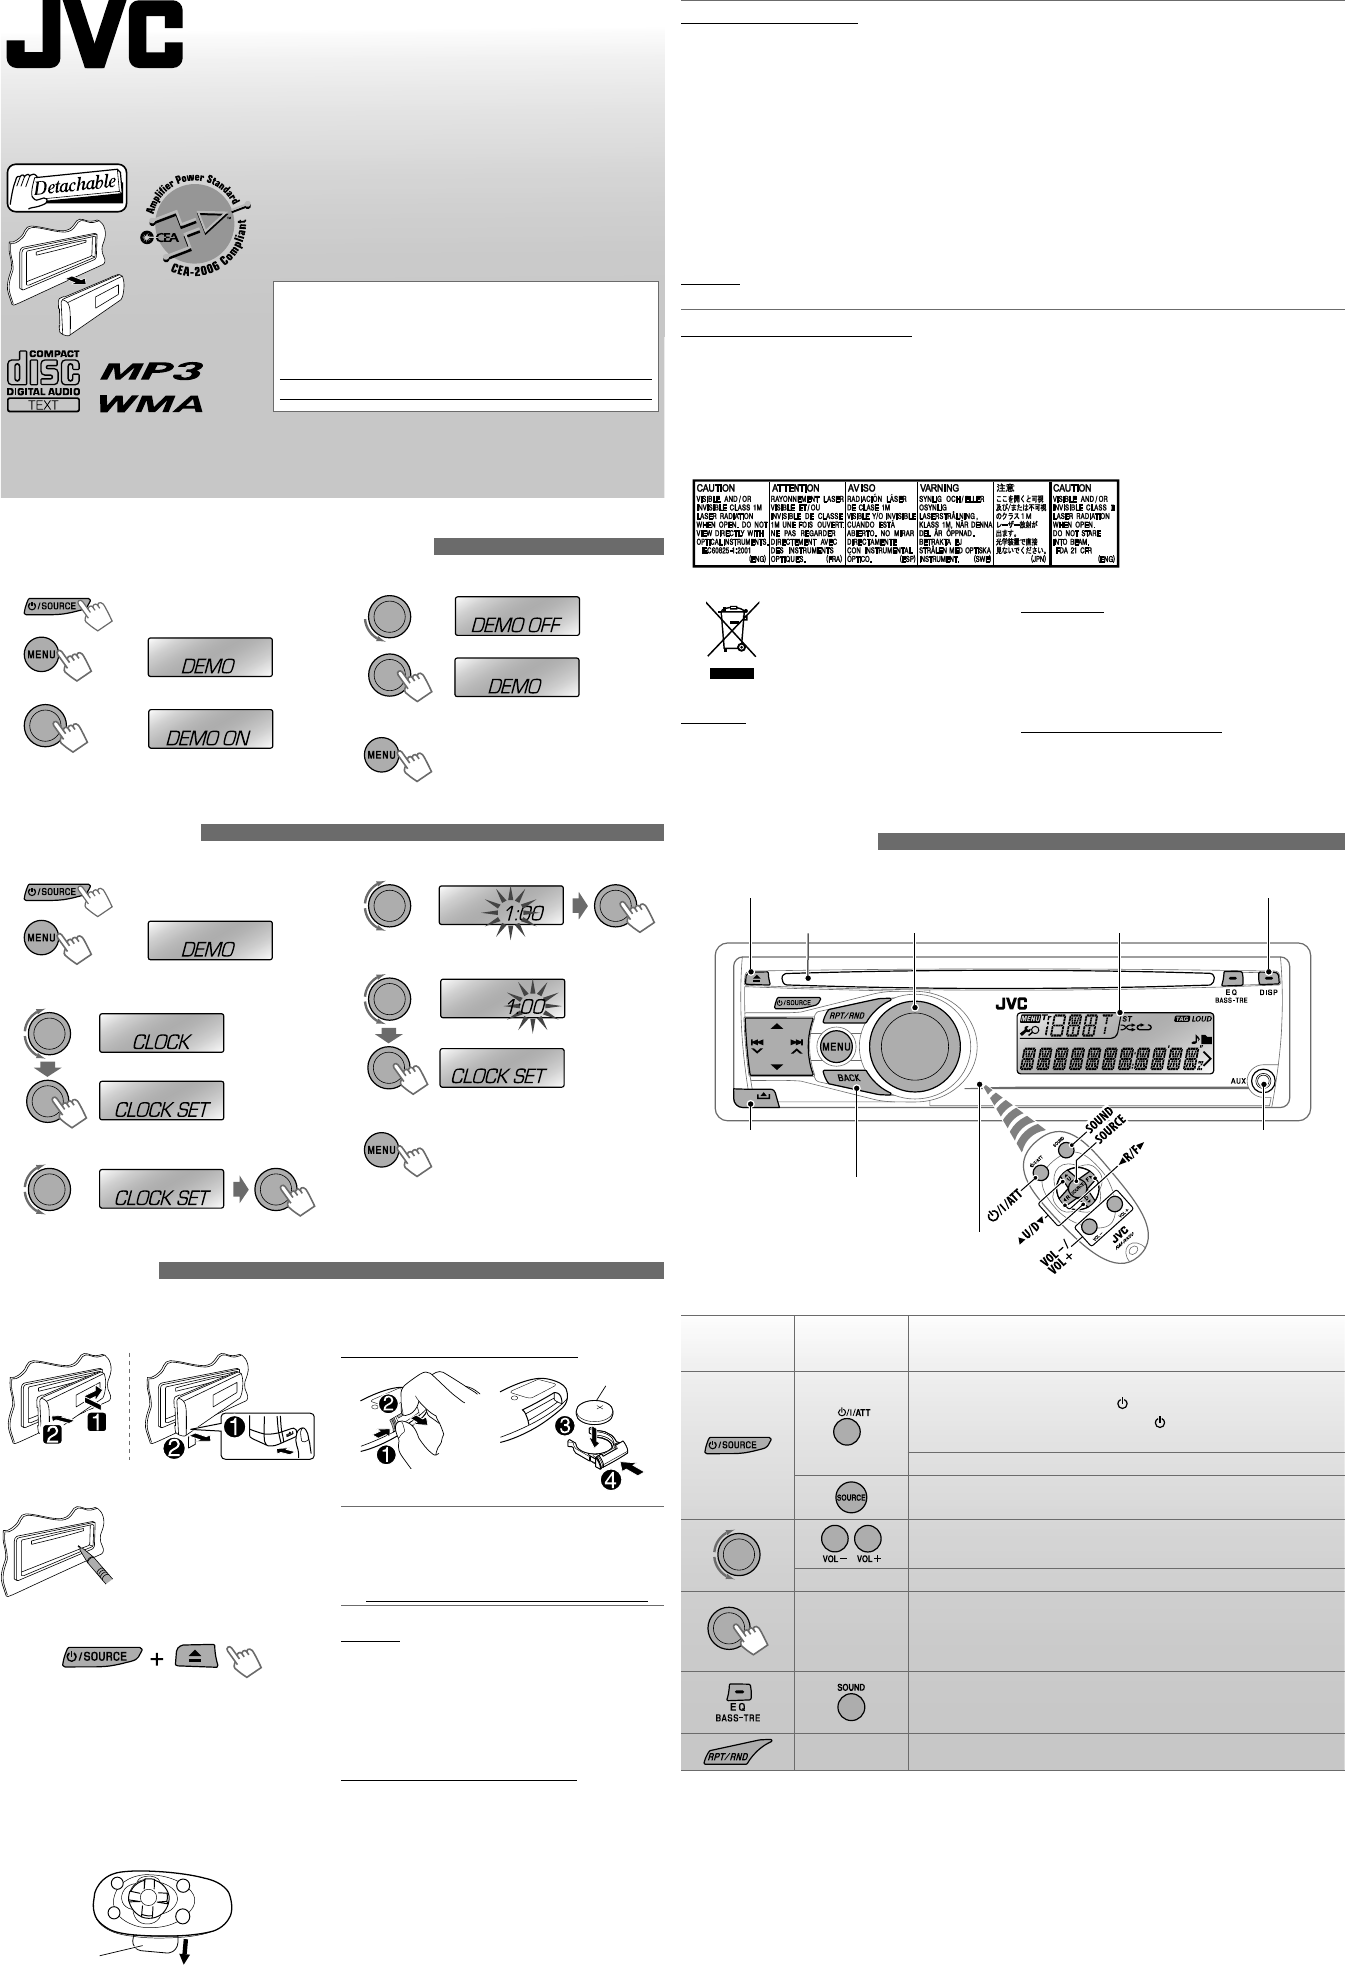 Jvc Car Kd R416 Pdf Document